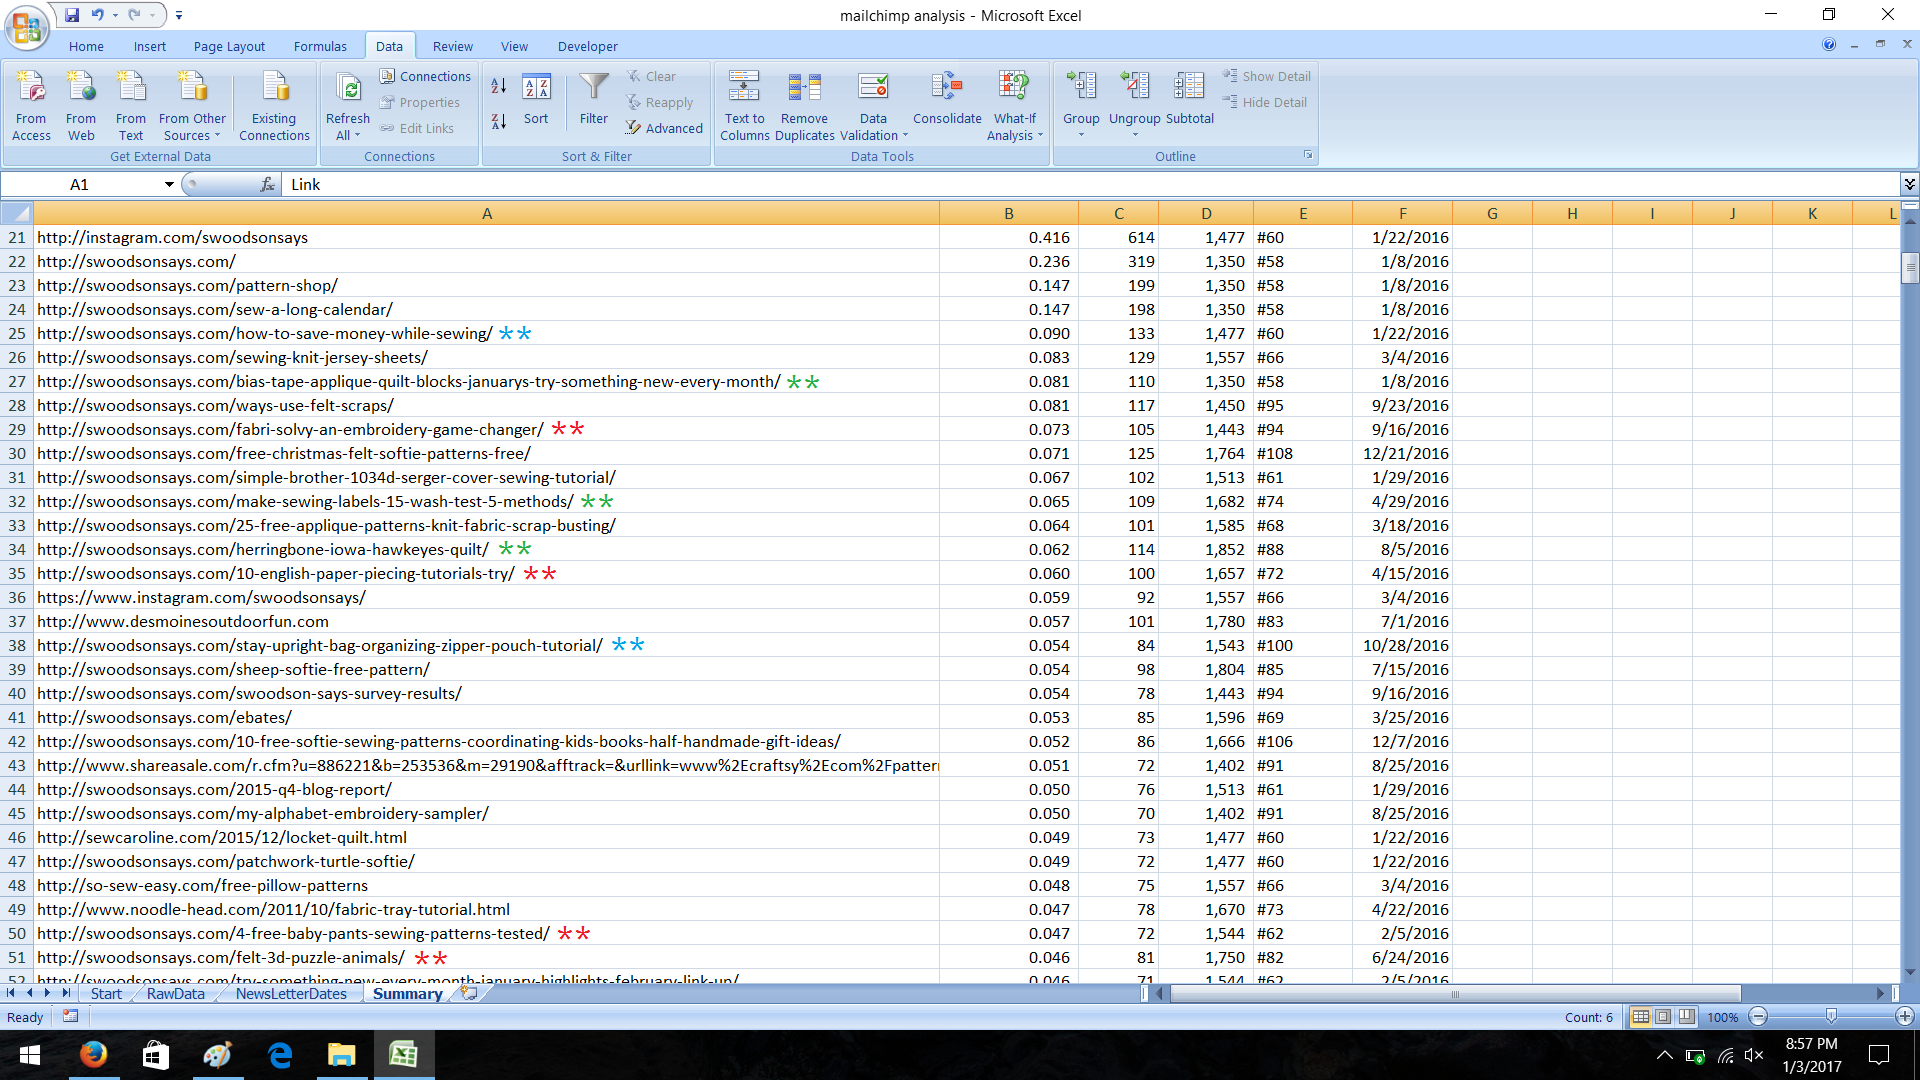 mailchimp-analysis-pos